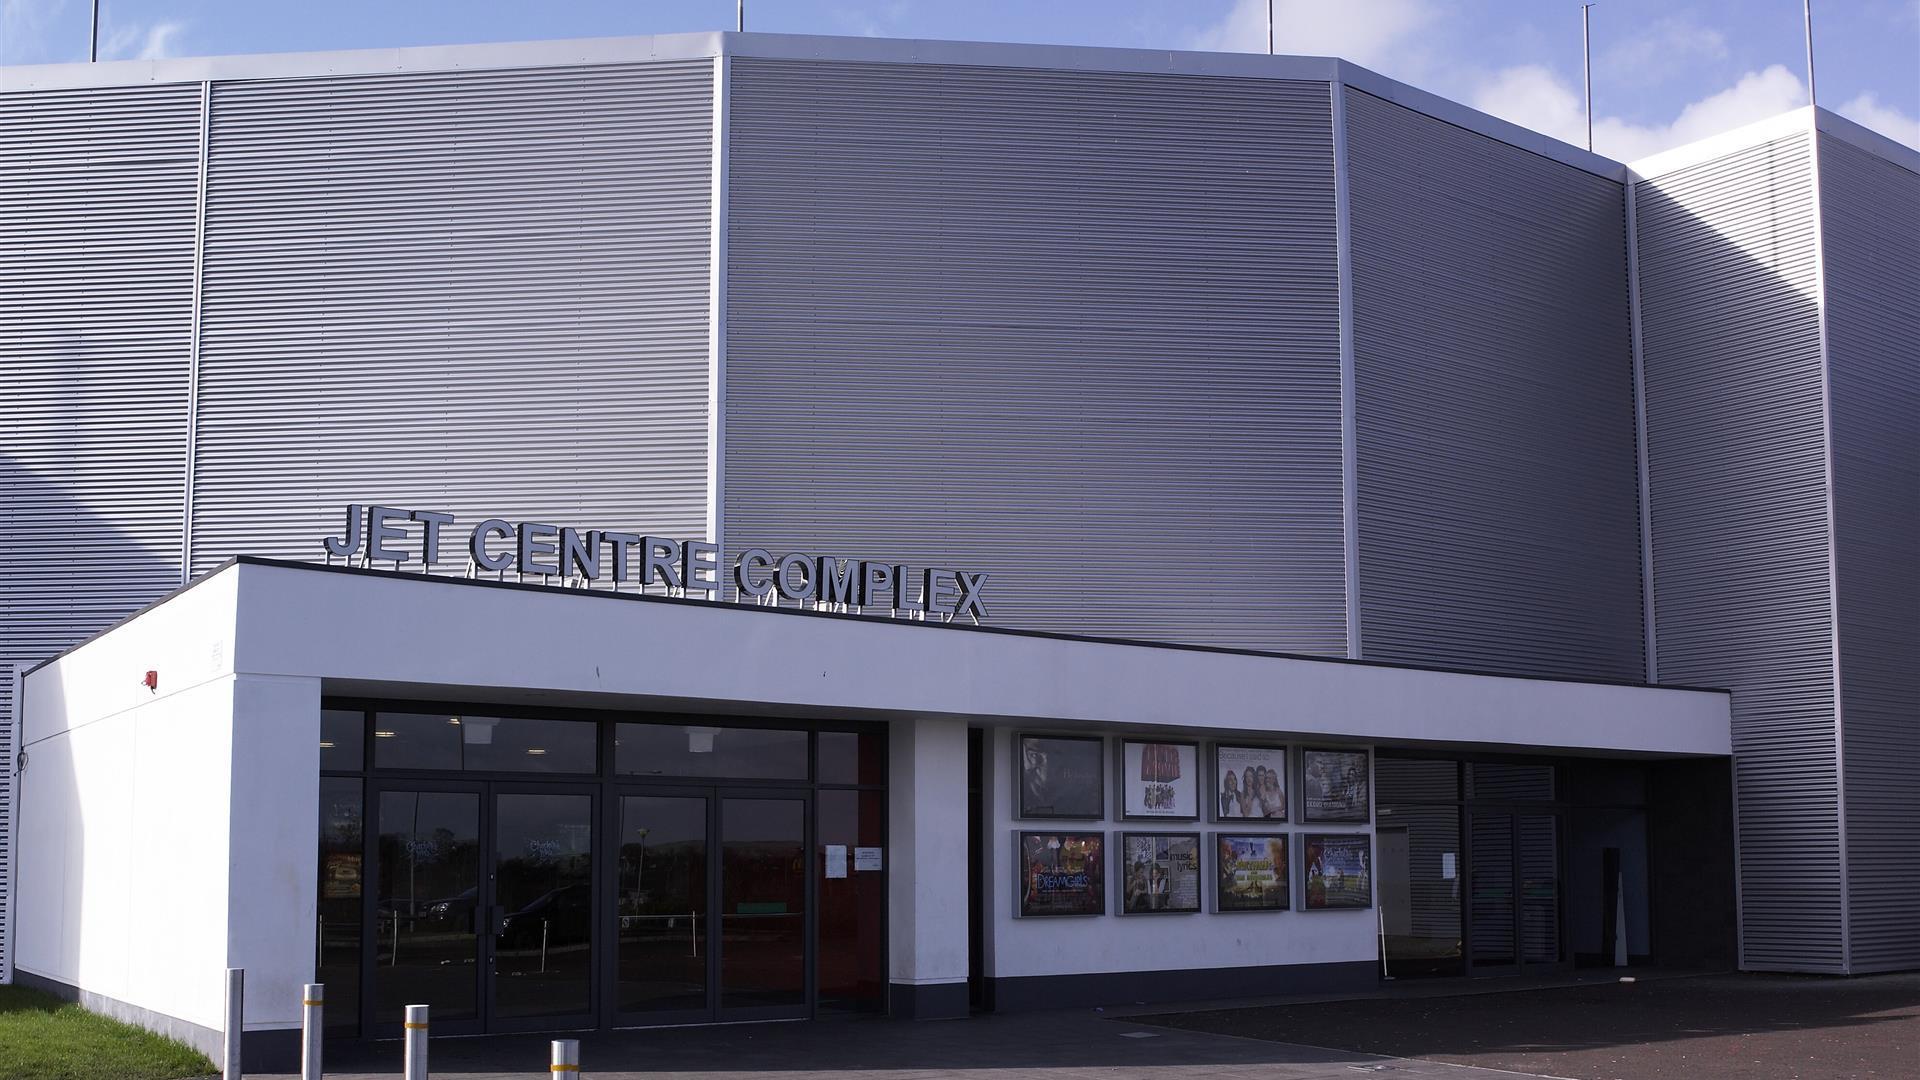 Moviehouse Cinema at The Jet Centre Coleraine